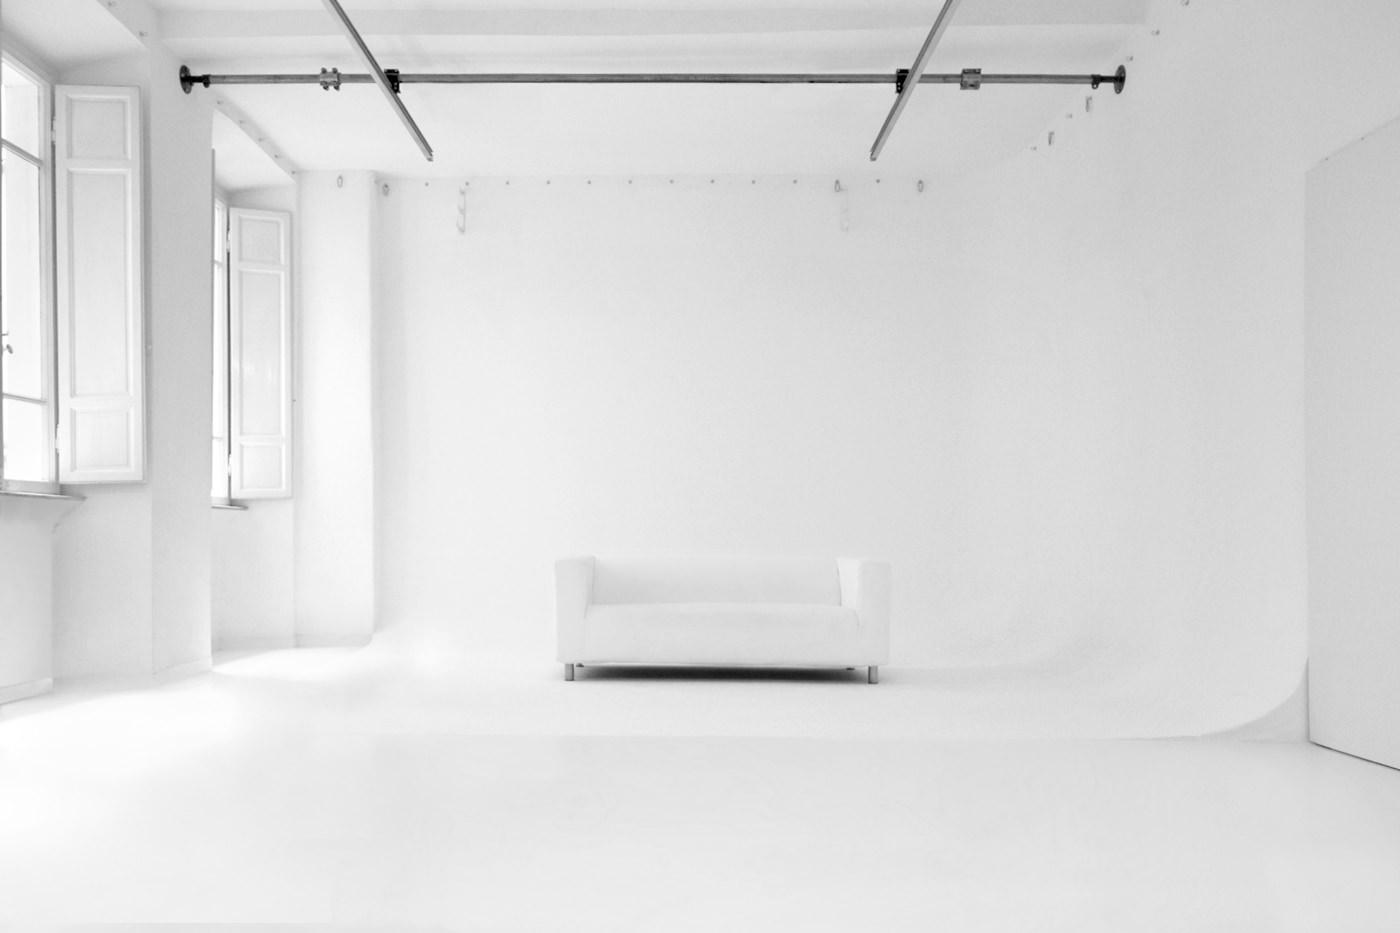 Studio-Fotografico-Limbo-Frontale-1400